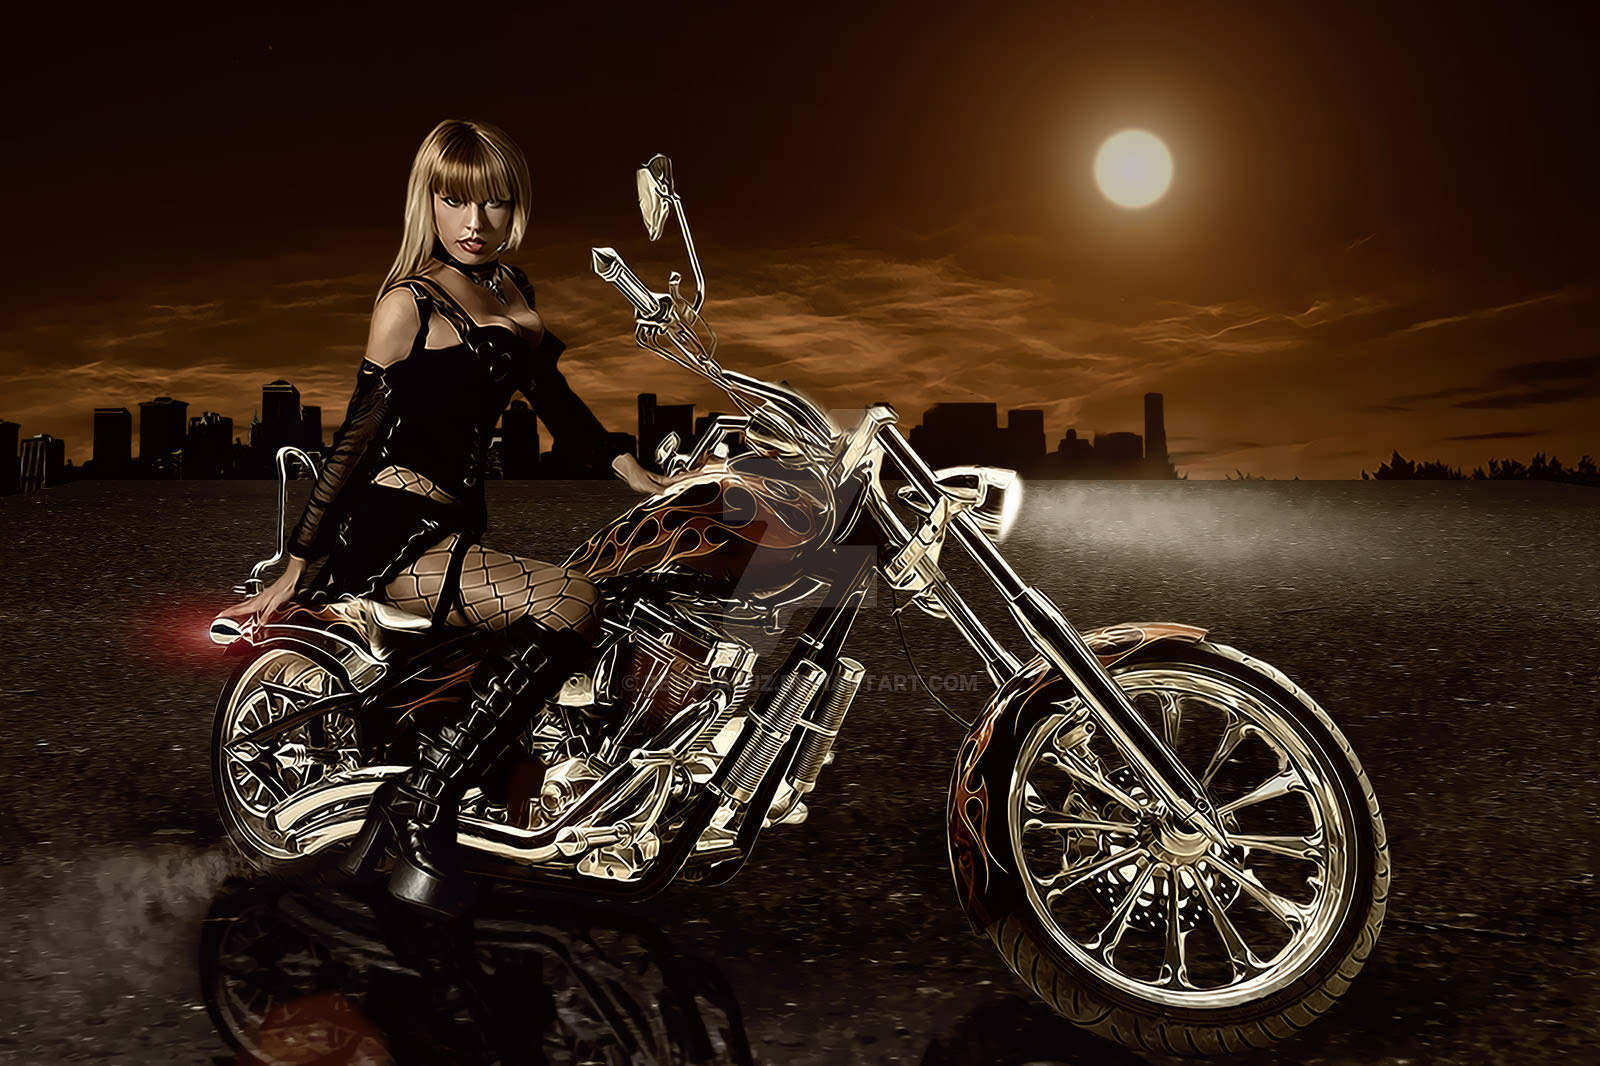 Luxury Motorcycle Hd Wallpapers: WallpaperSafari